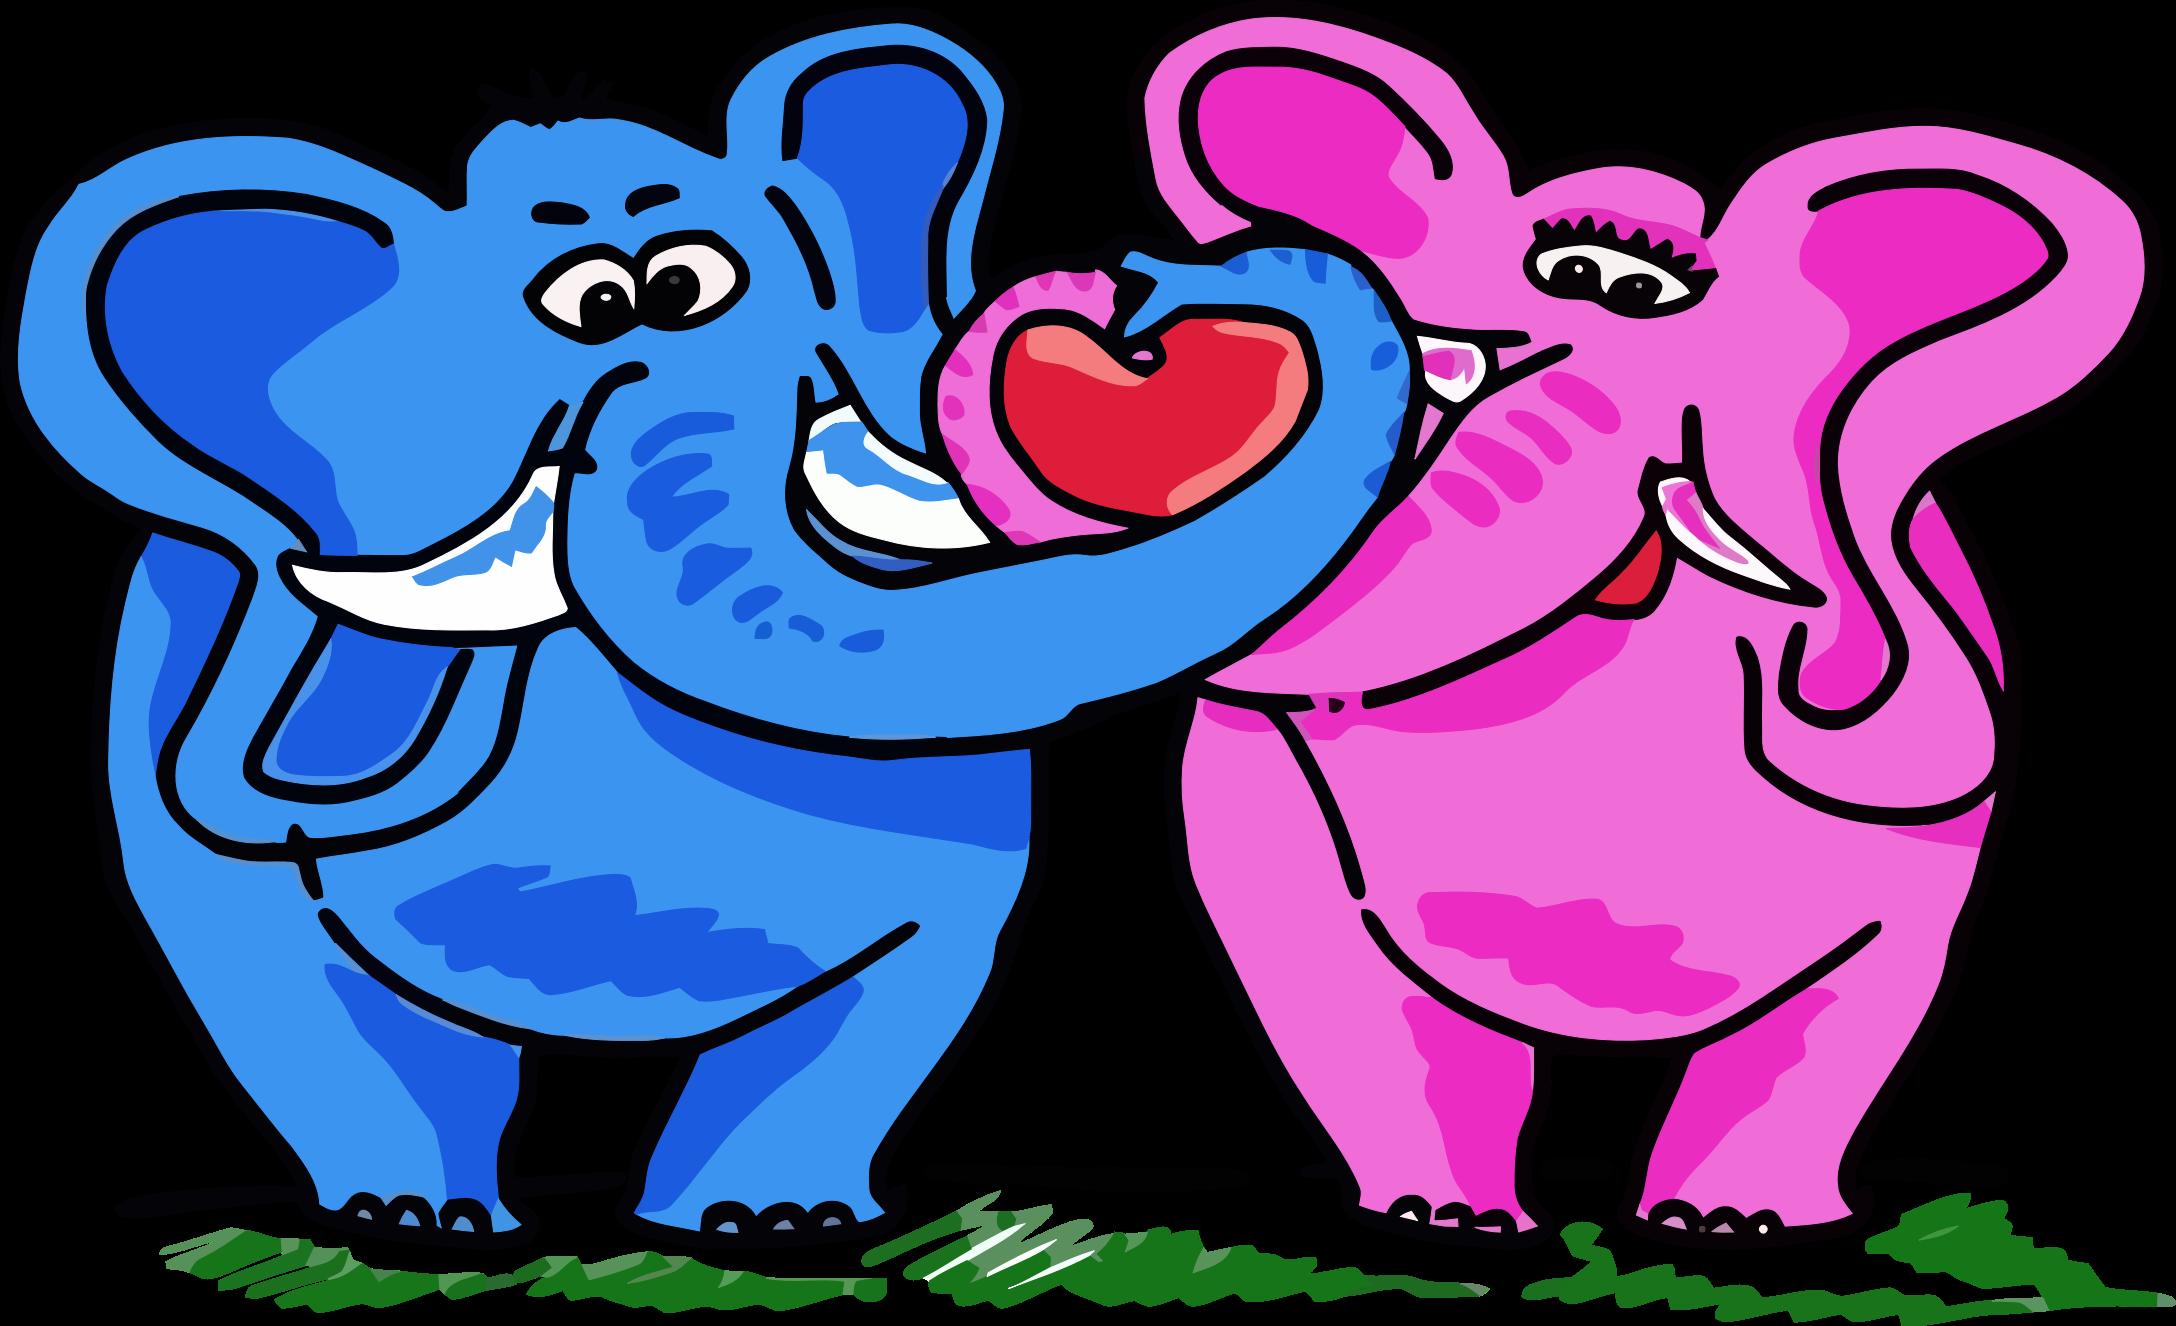 Kopel clipart elephant Couple Elephant Couple Clipart Elephant